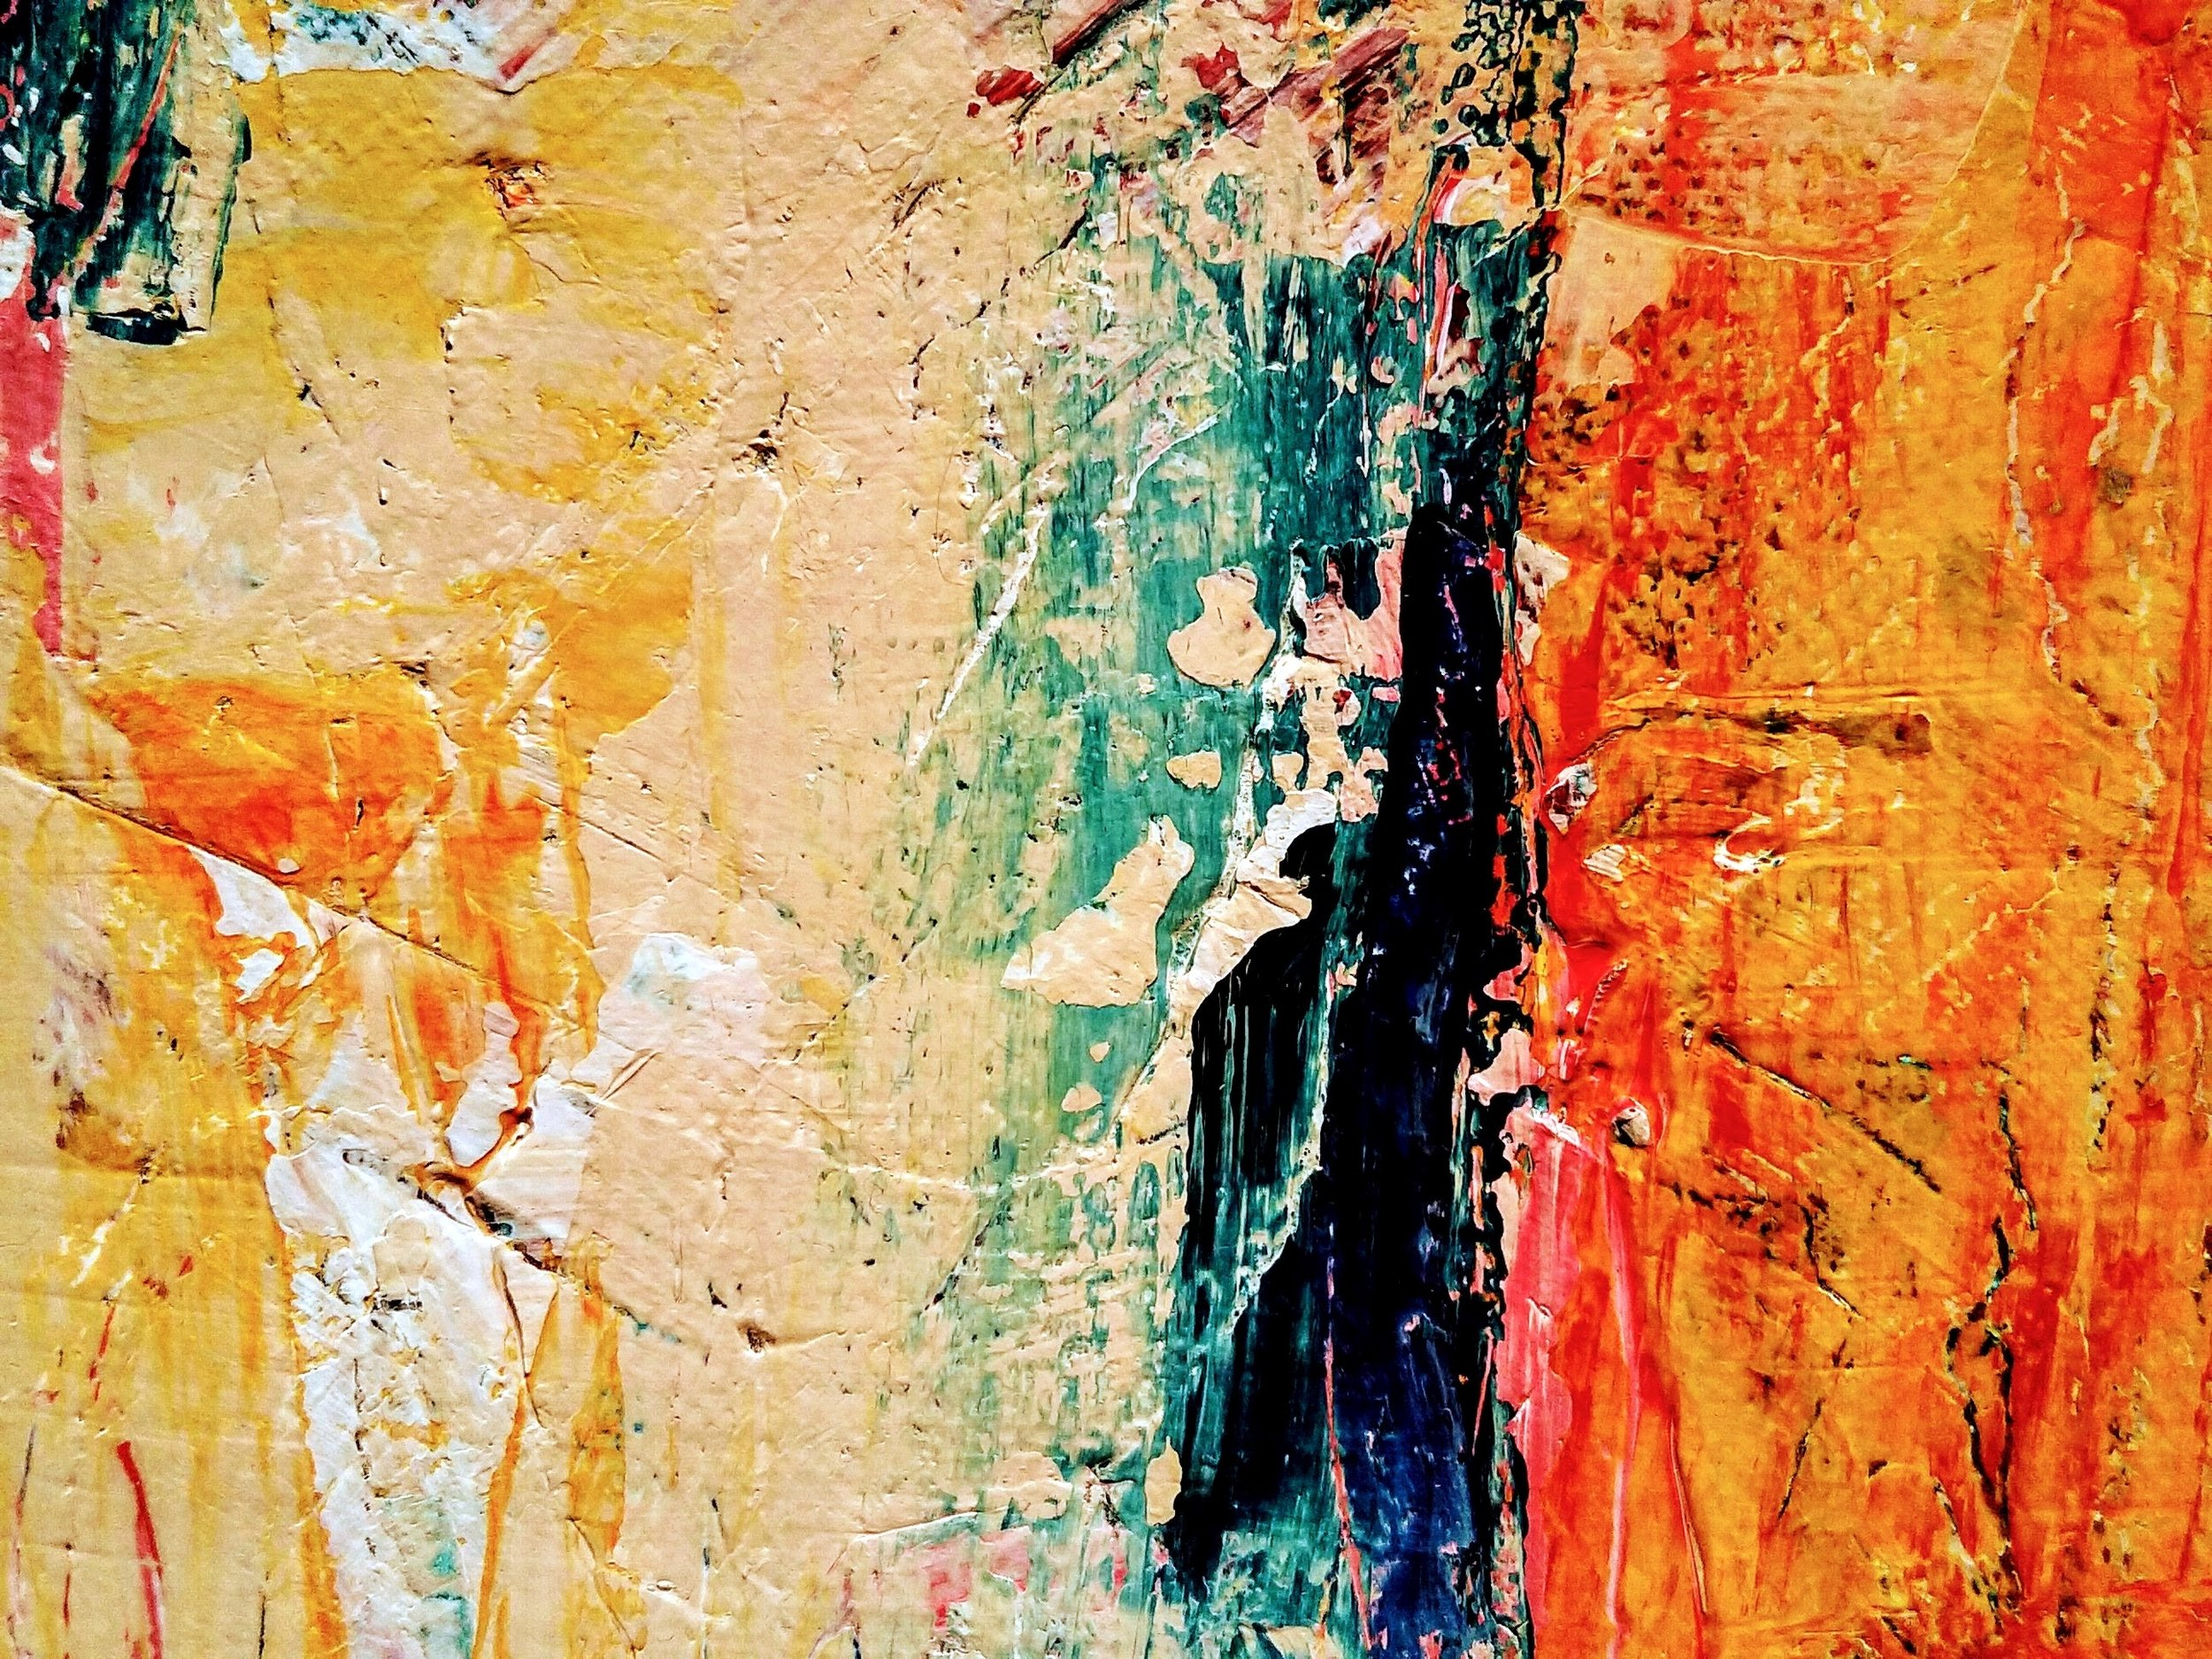 abstract-art-artistic-1050822.jpg